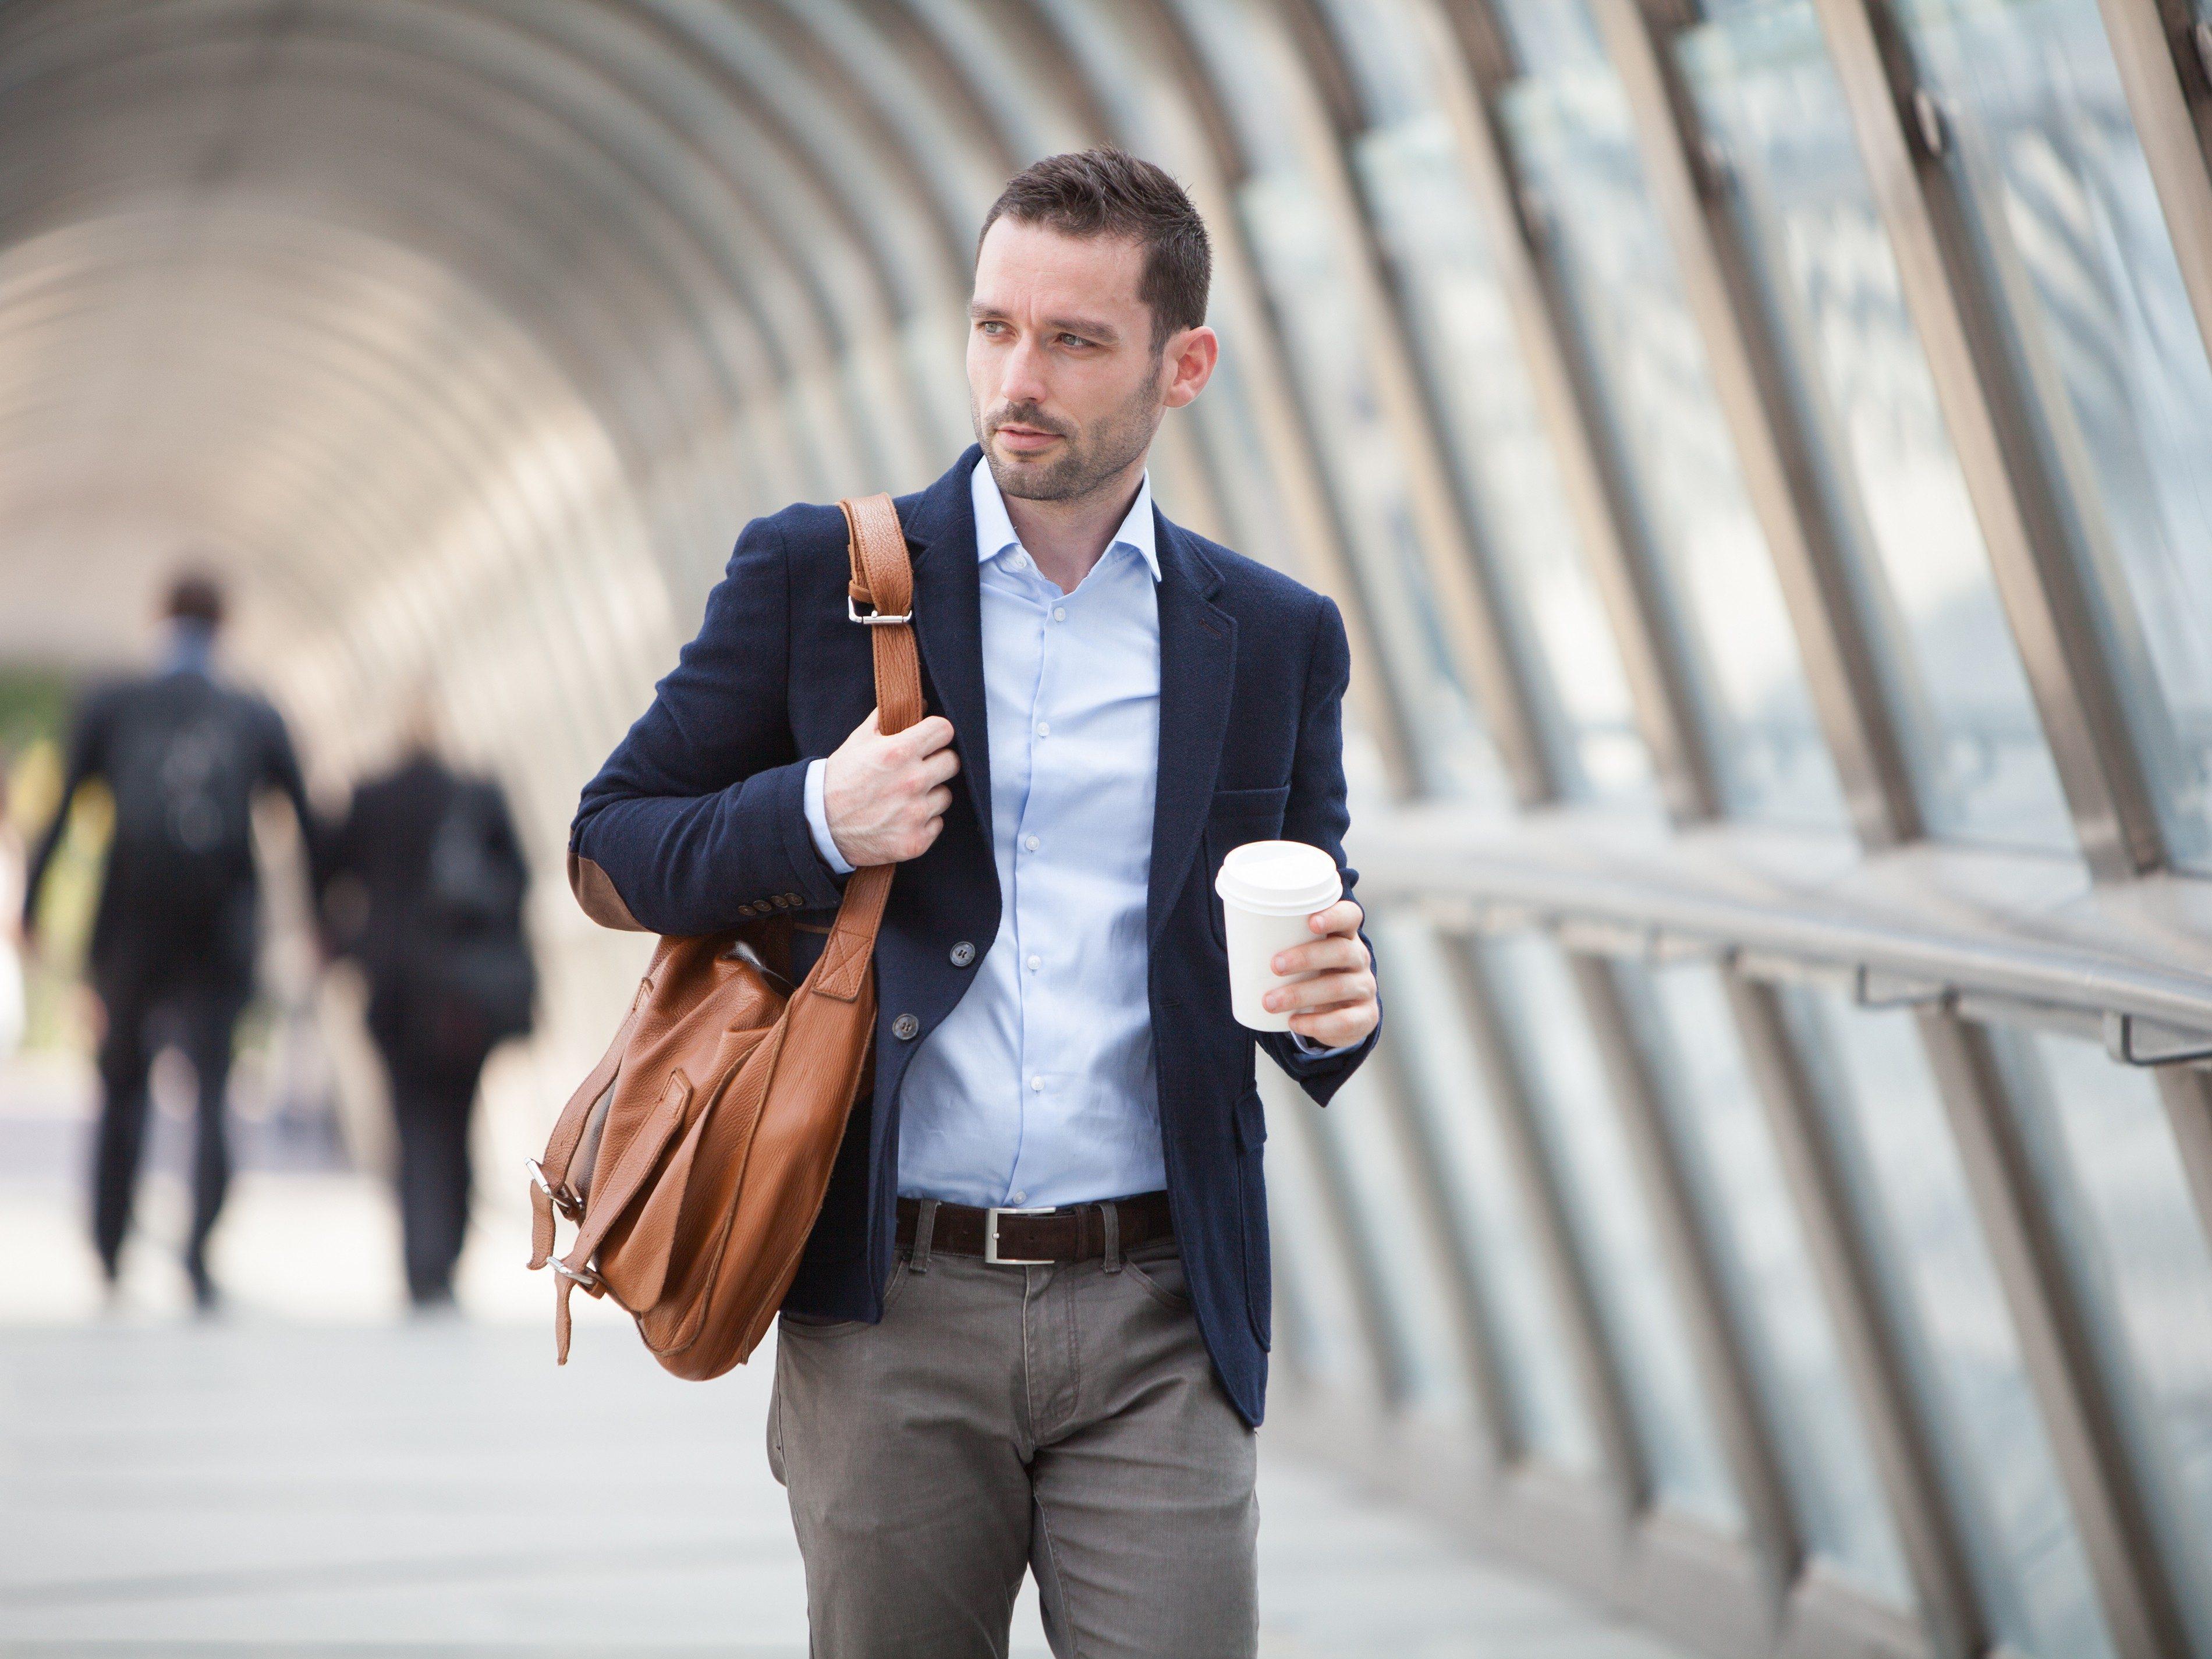 2. Prevent jet lag by avoiding alcohol and caffeine